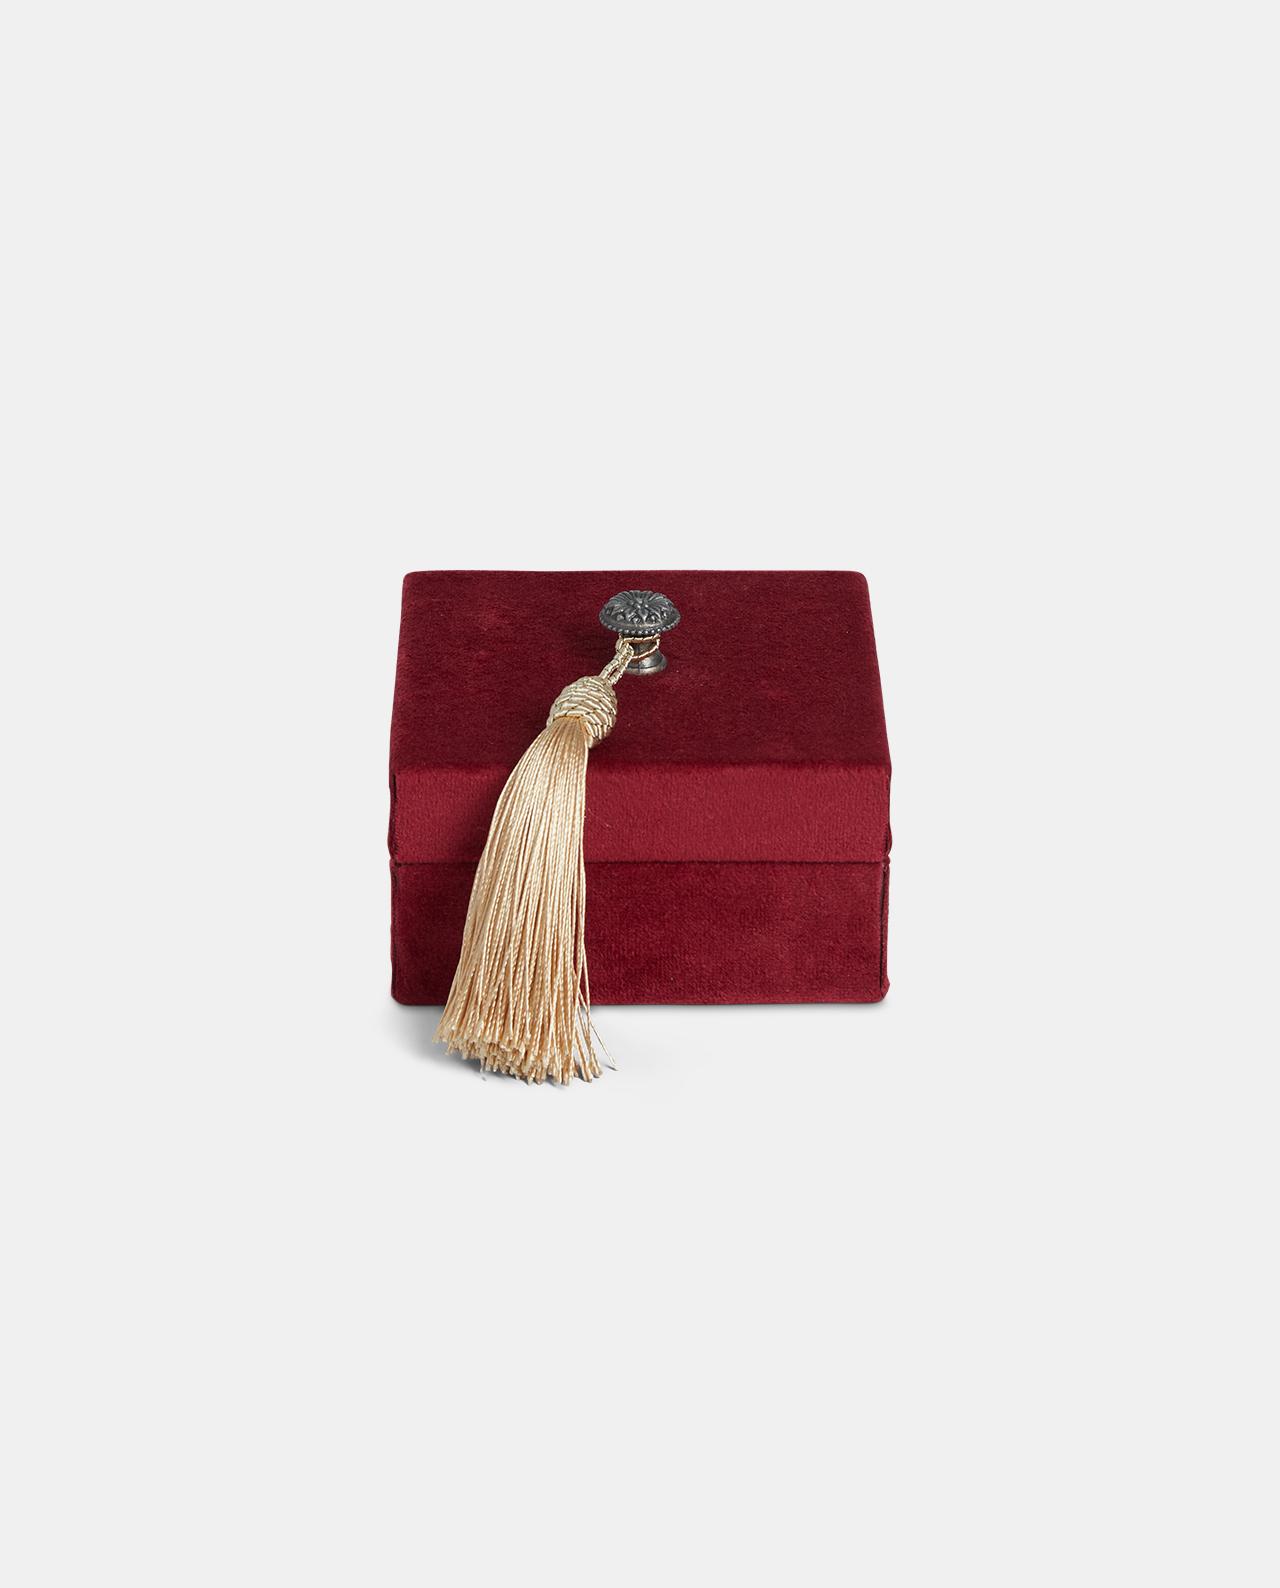 Small Red Velvet Decorative Box